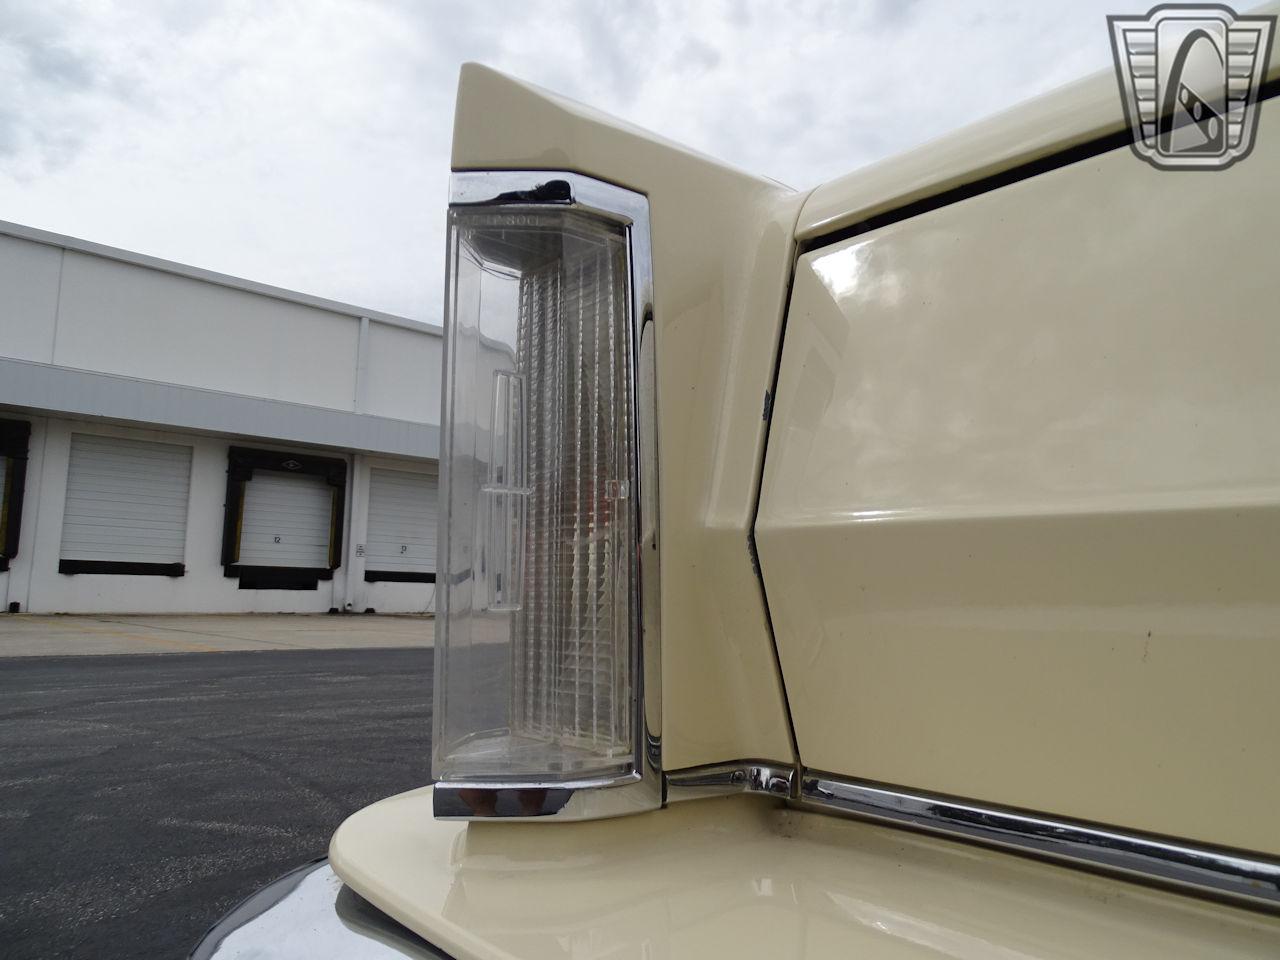 1983 Lincoln Continental 26